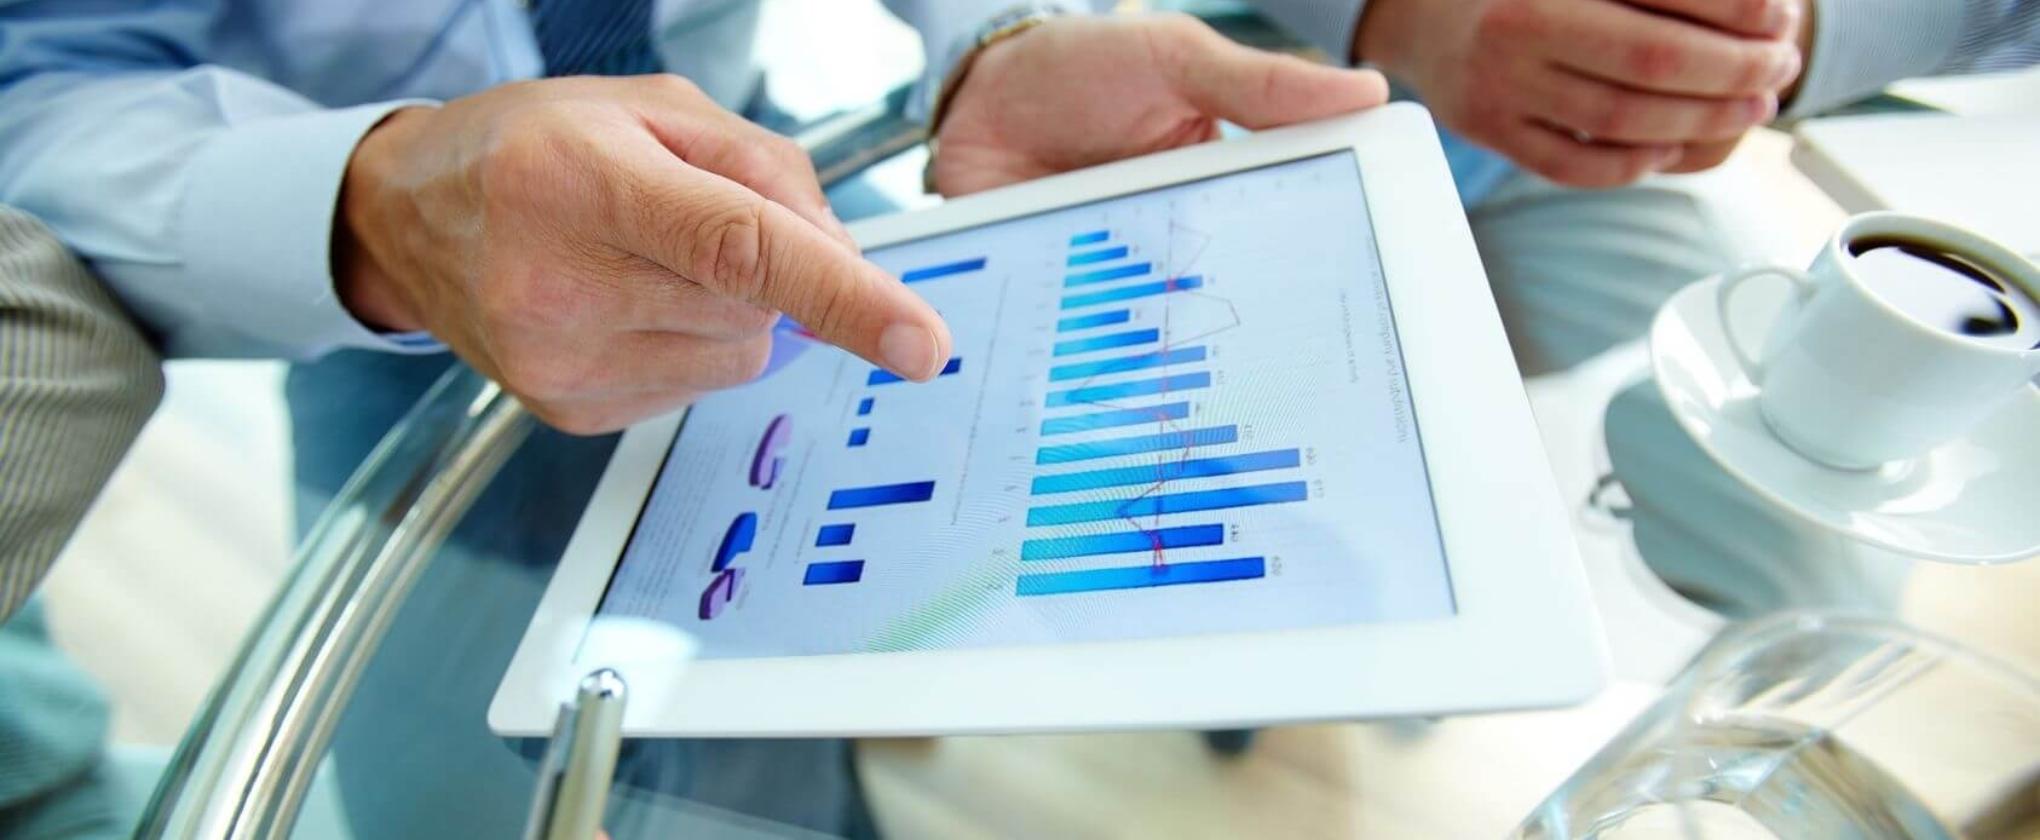 How Revenue-Based Financing Works